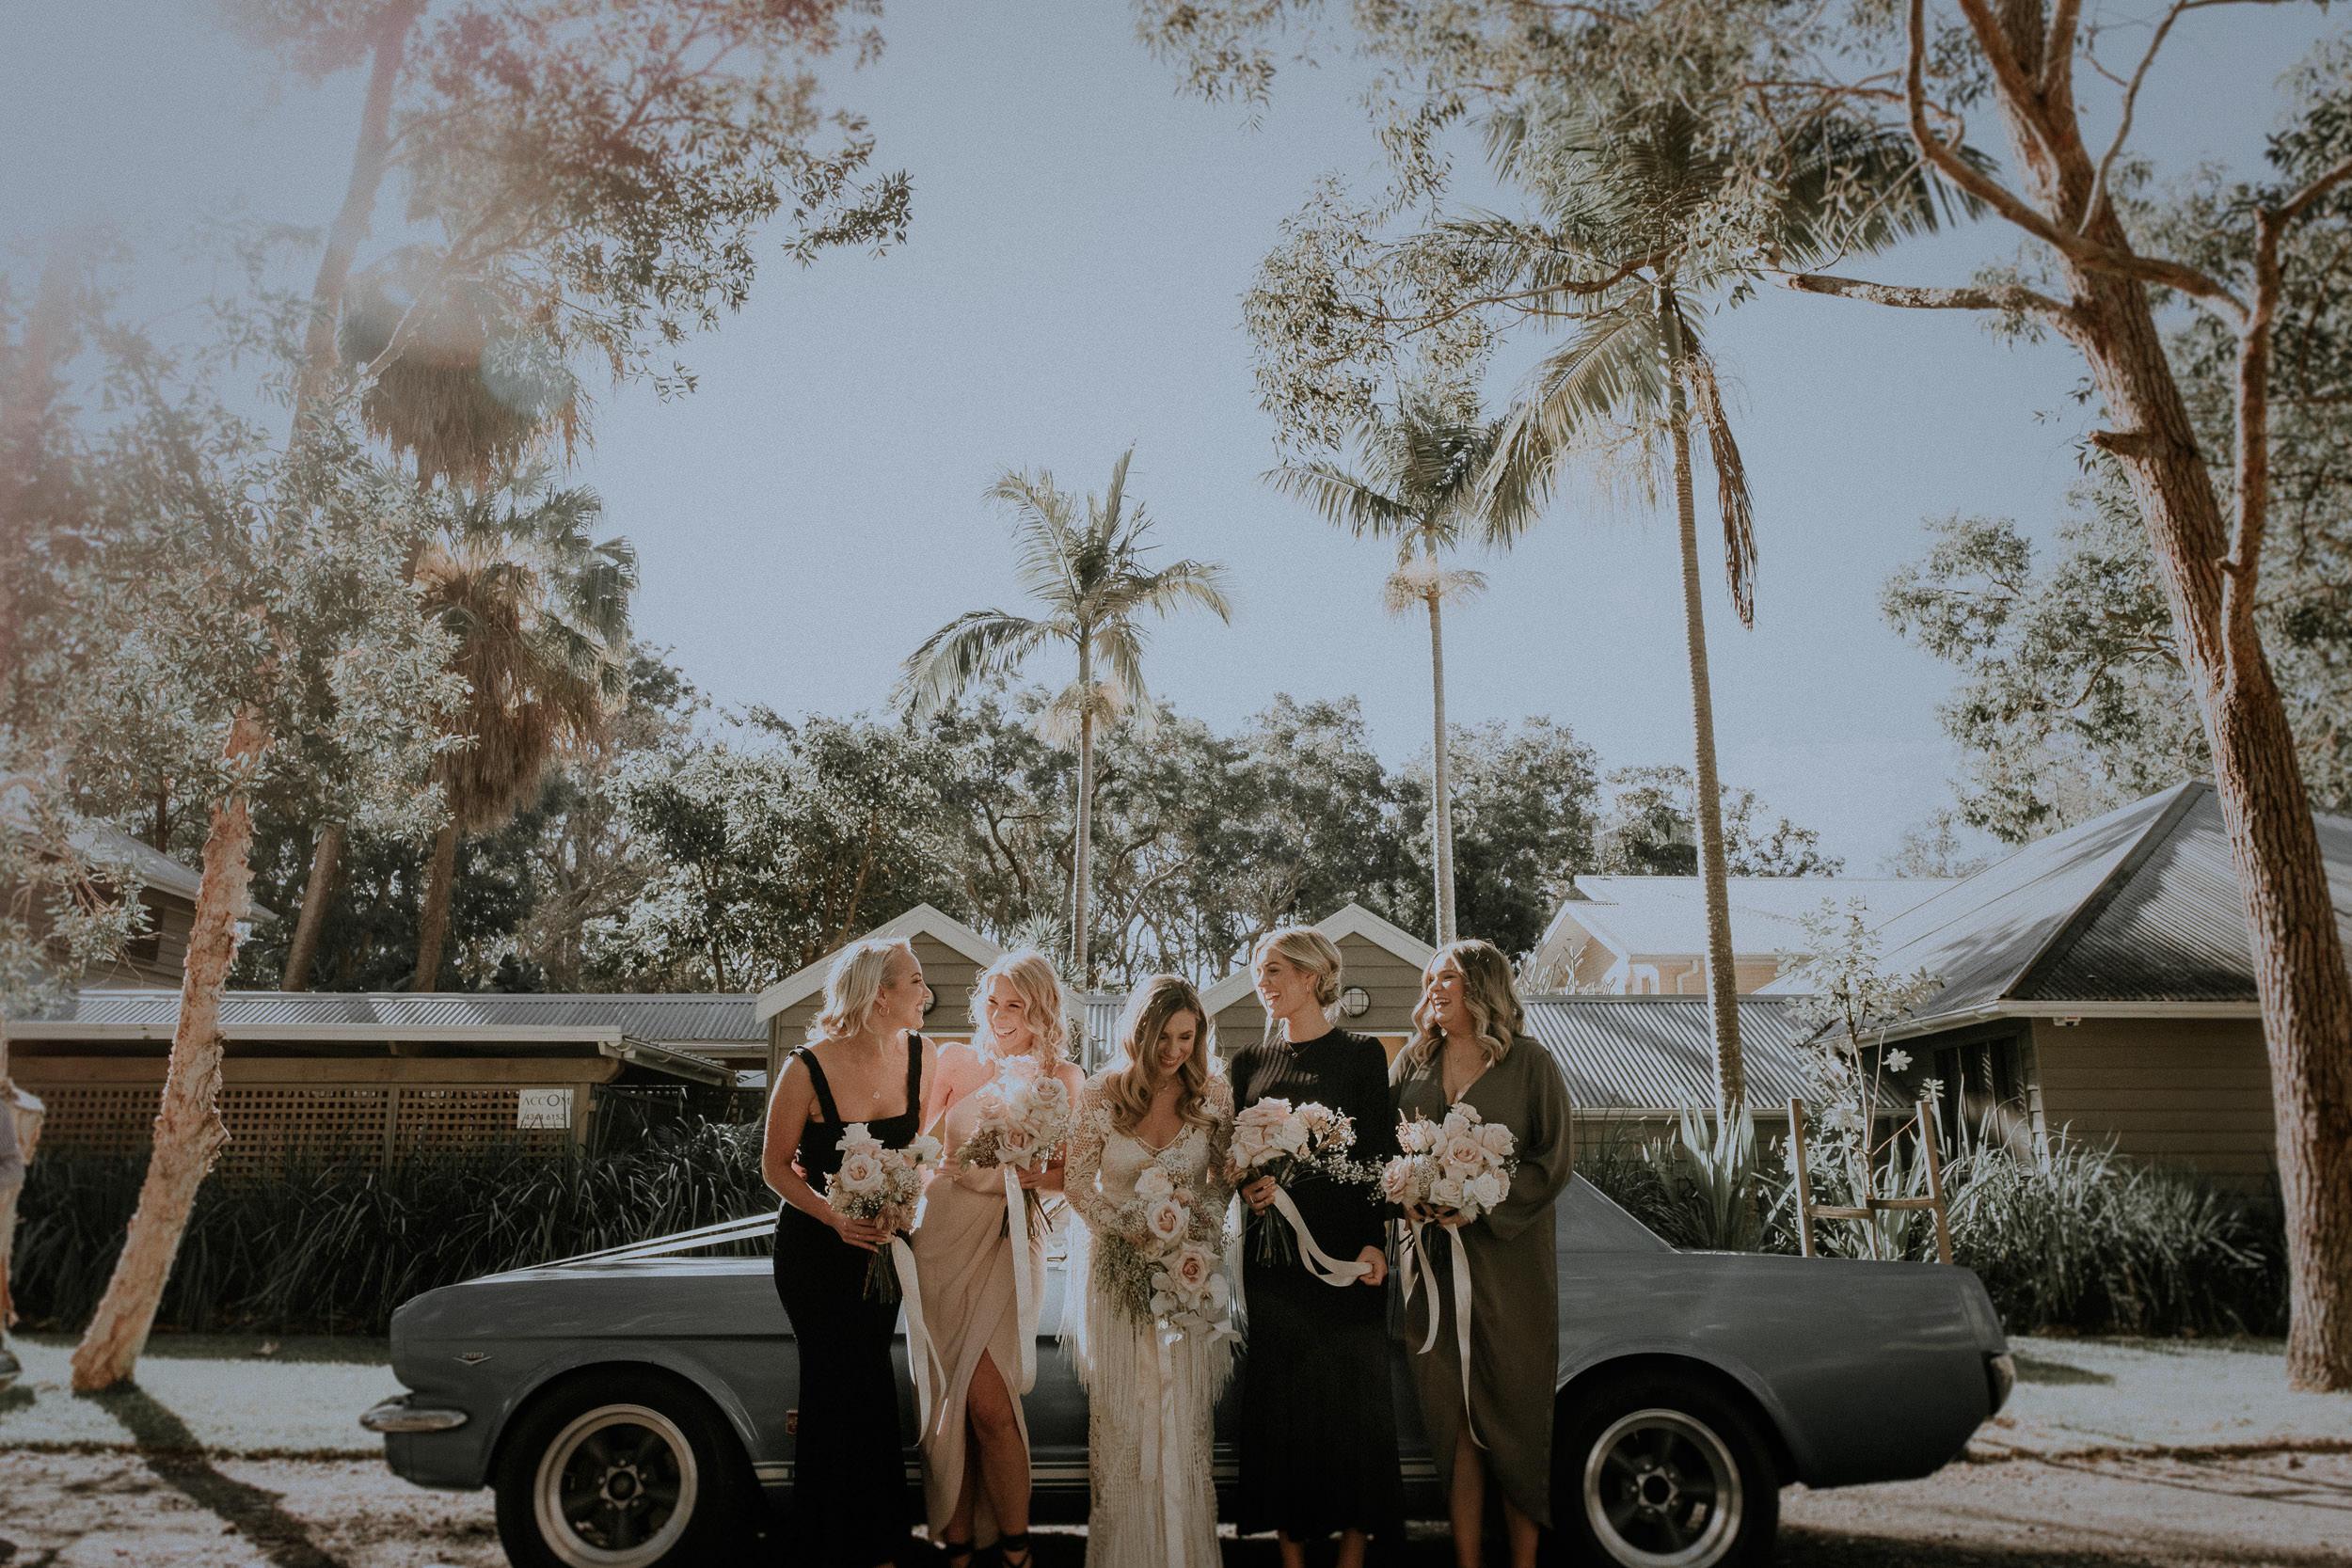 S&A Elopement - Kings & Thieves - Shred 'Til Dead - Central Coast Beach Forest Wedding - 132.jpg